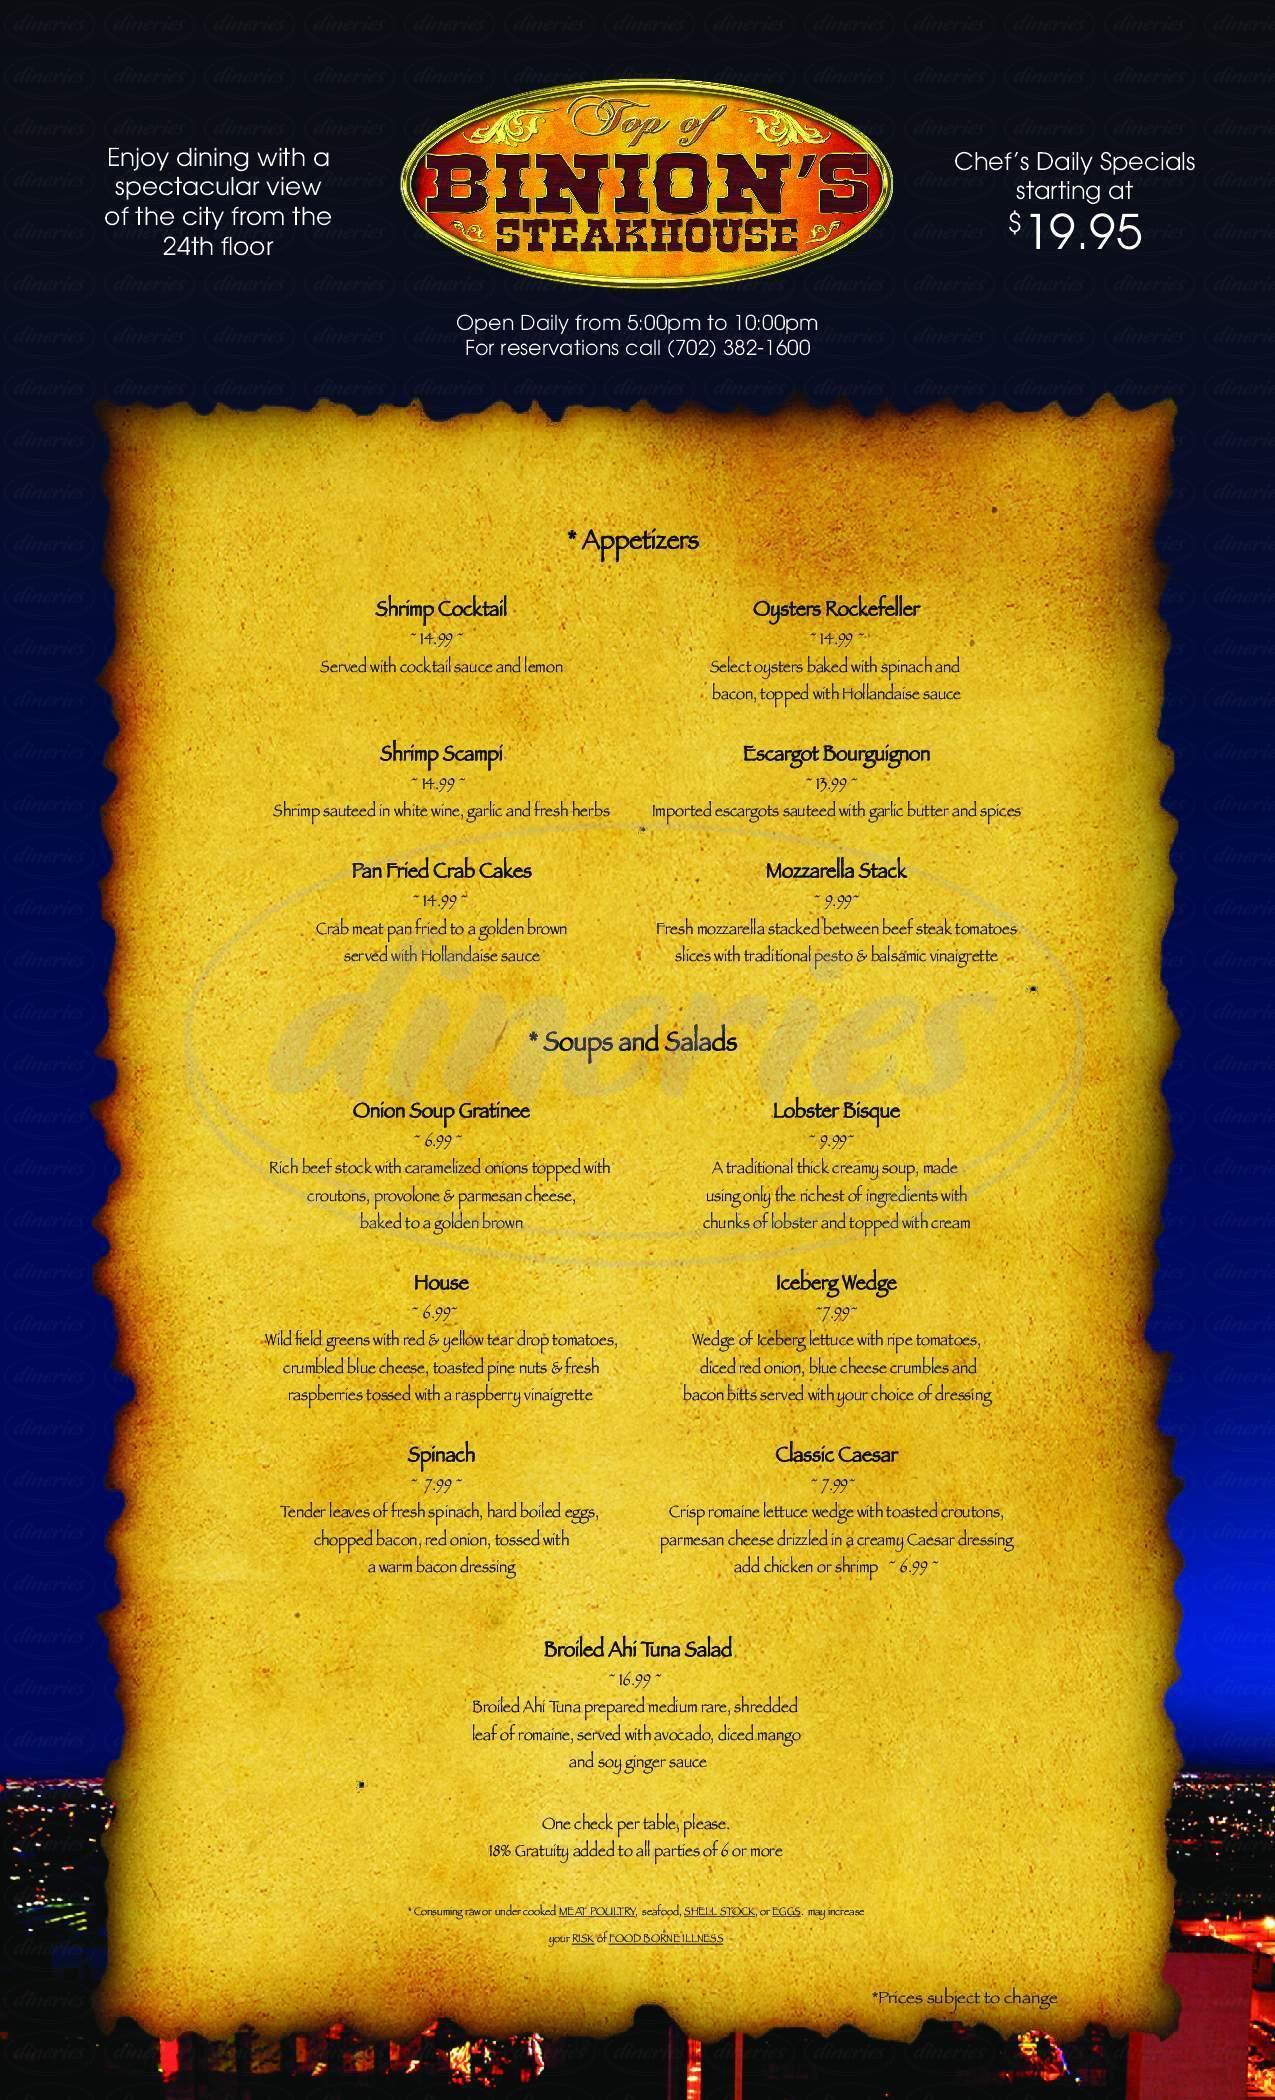 menu for Binion's Ranch Steak House